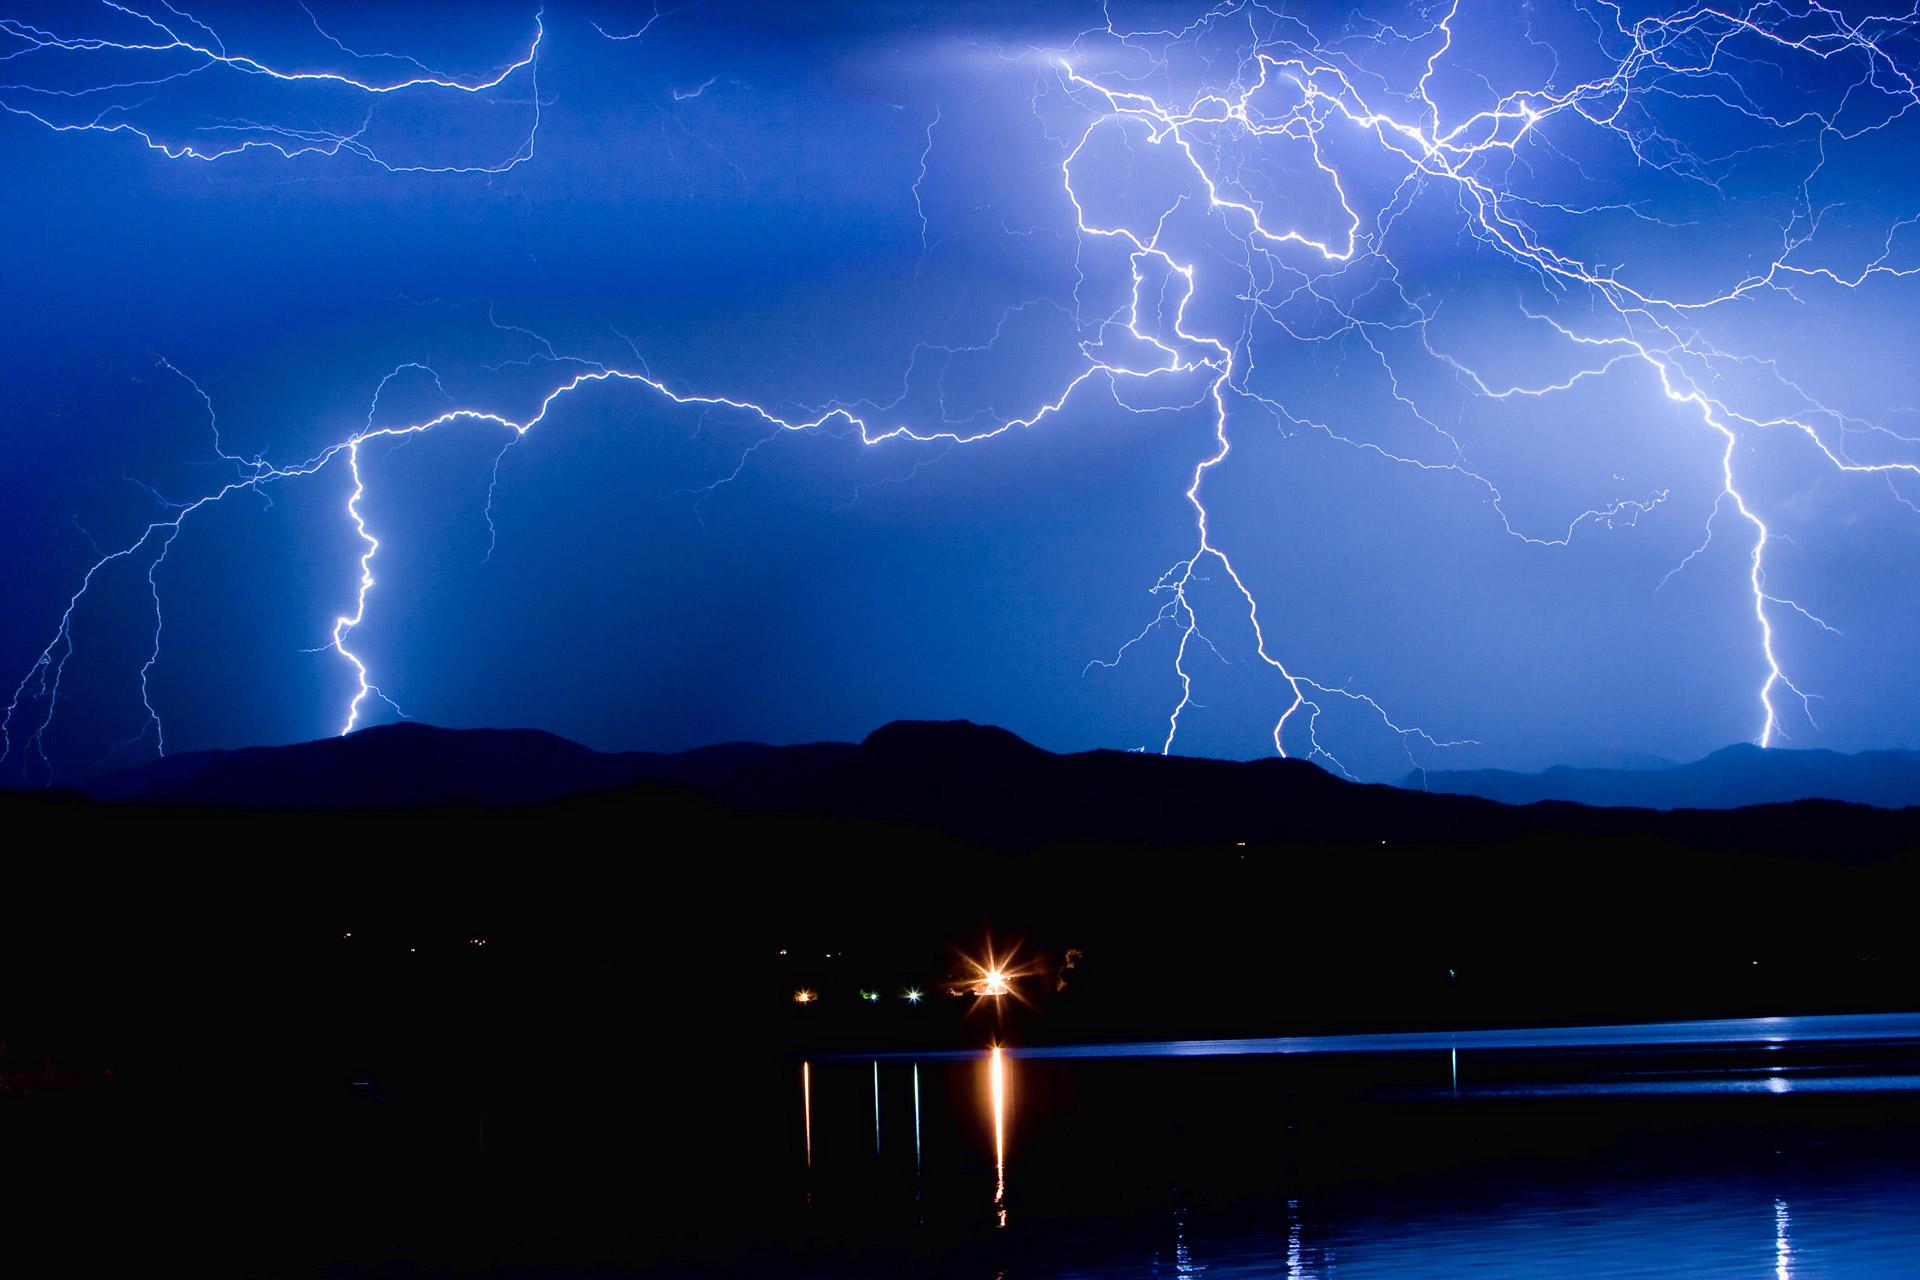 dryspark lightning background